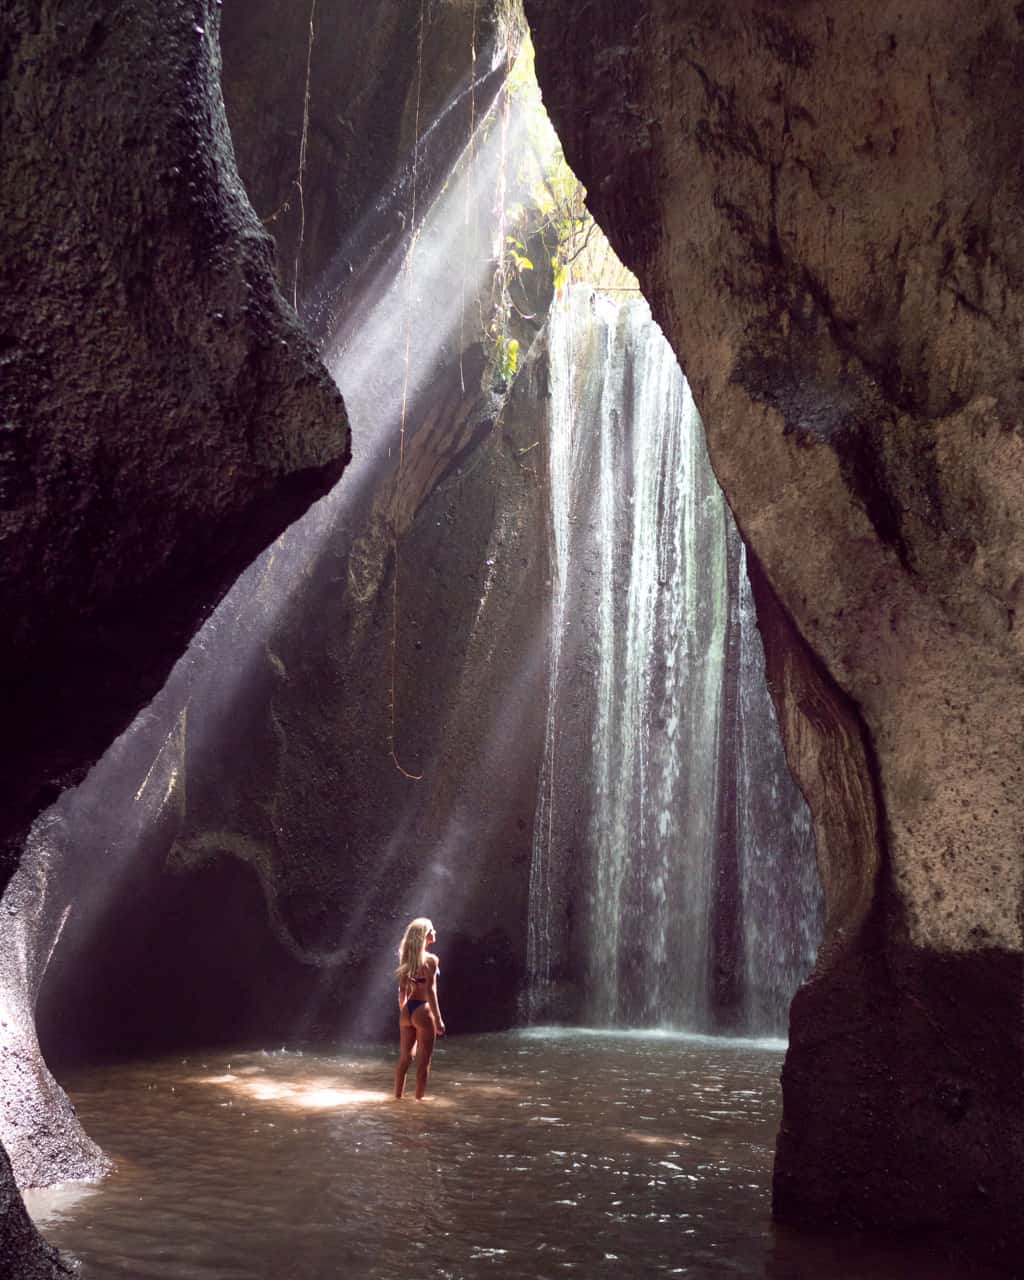 tukad-cepung-waterfall-bali-lightray-blog-Ilse